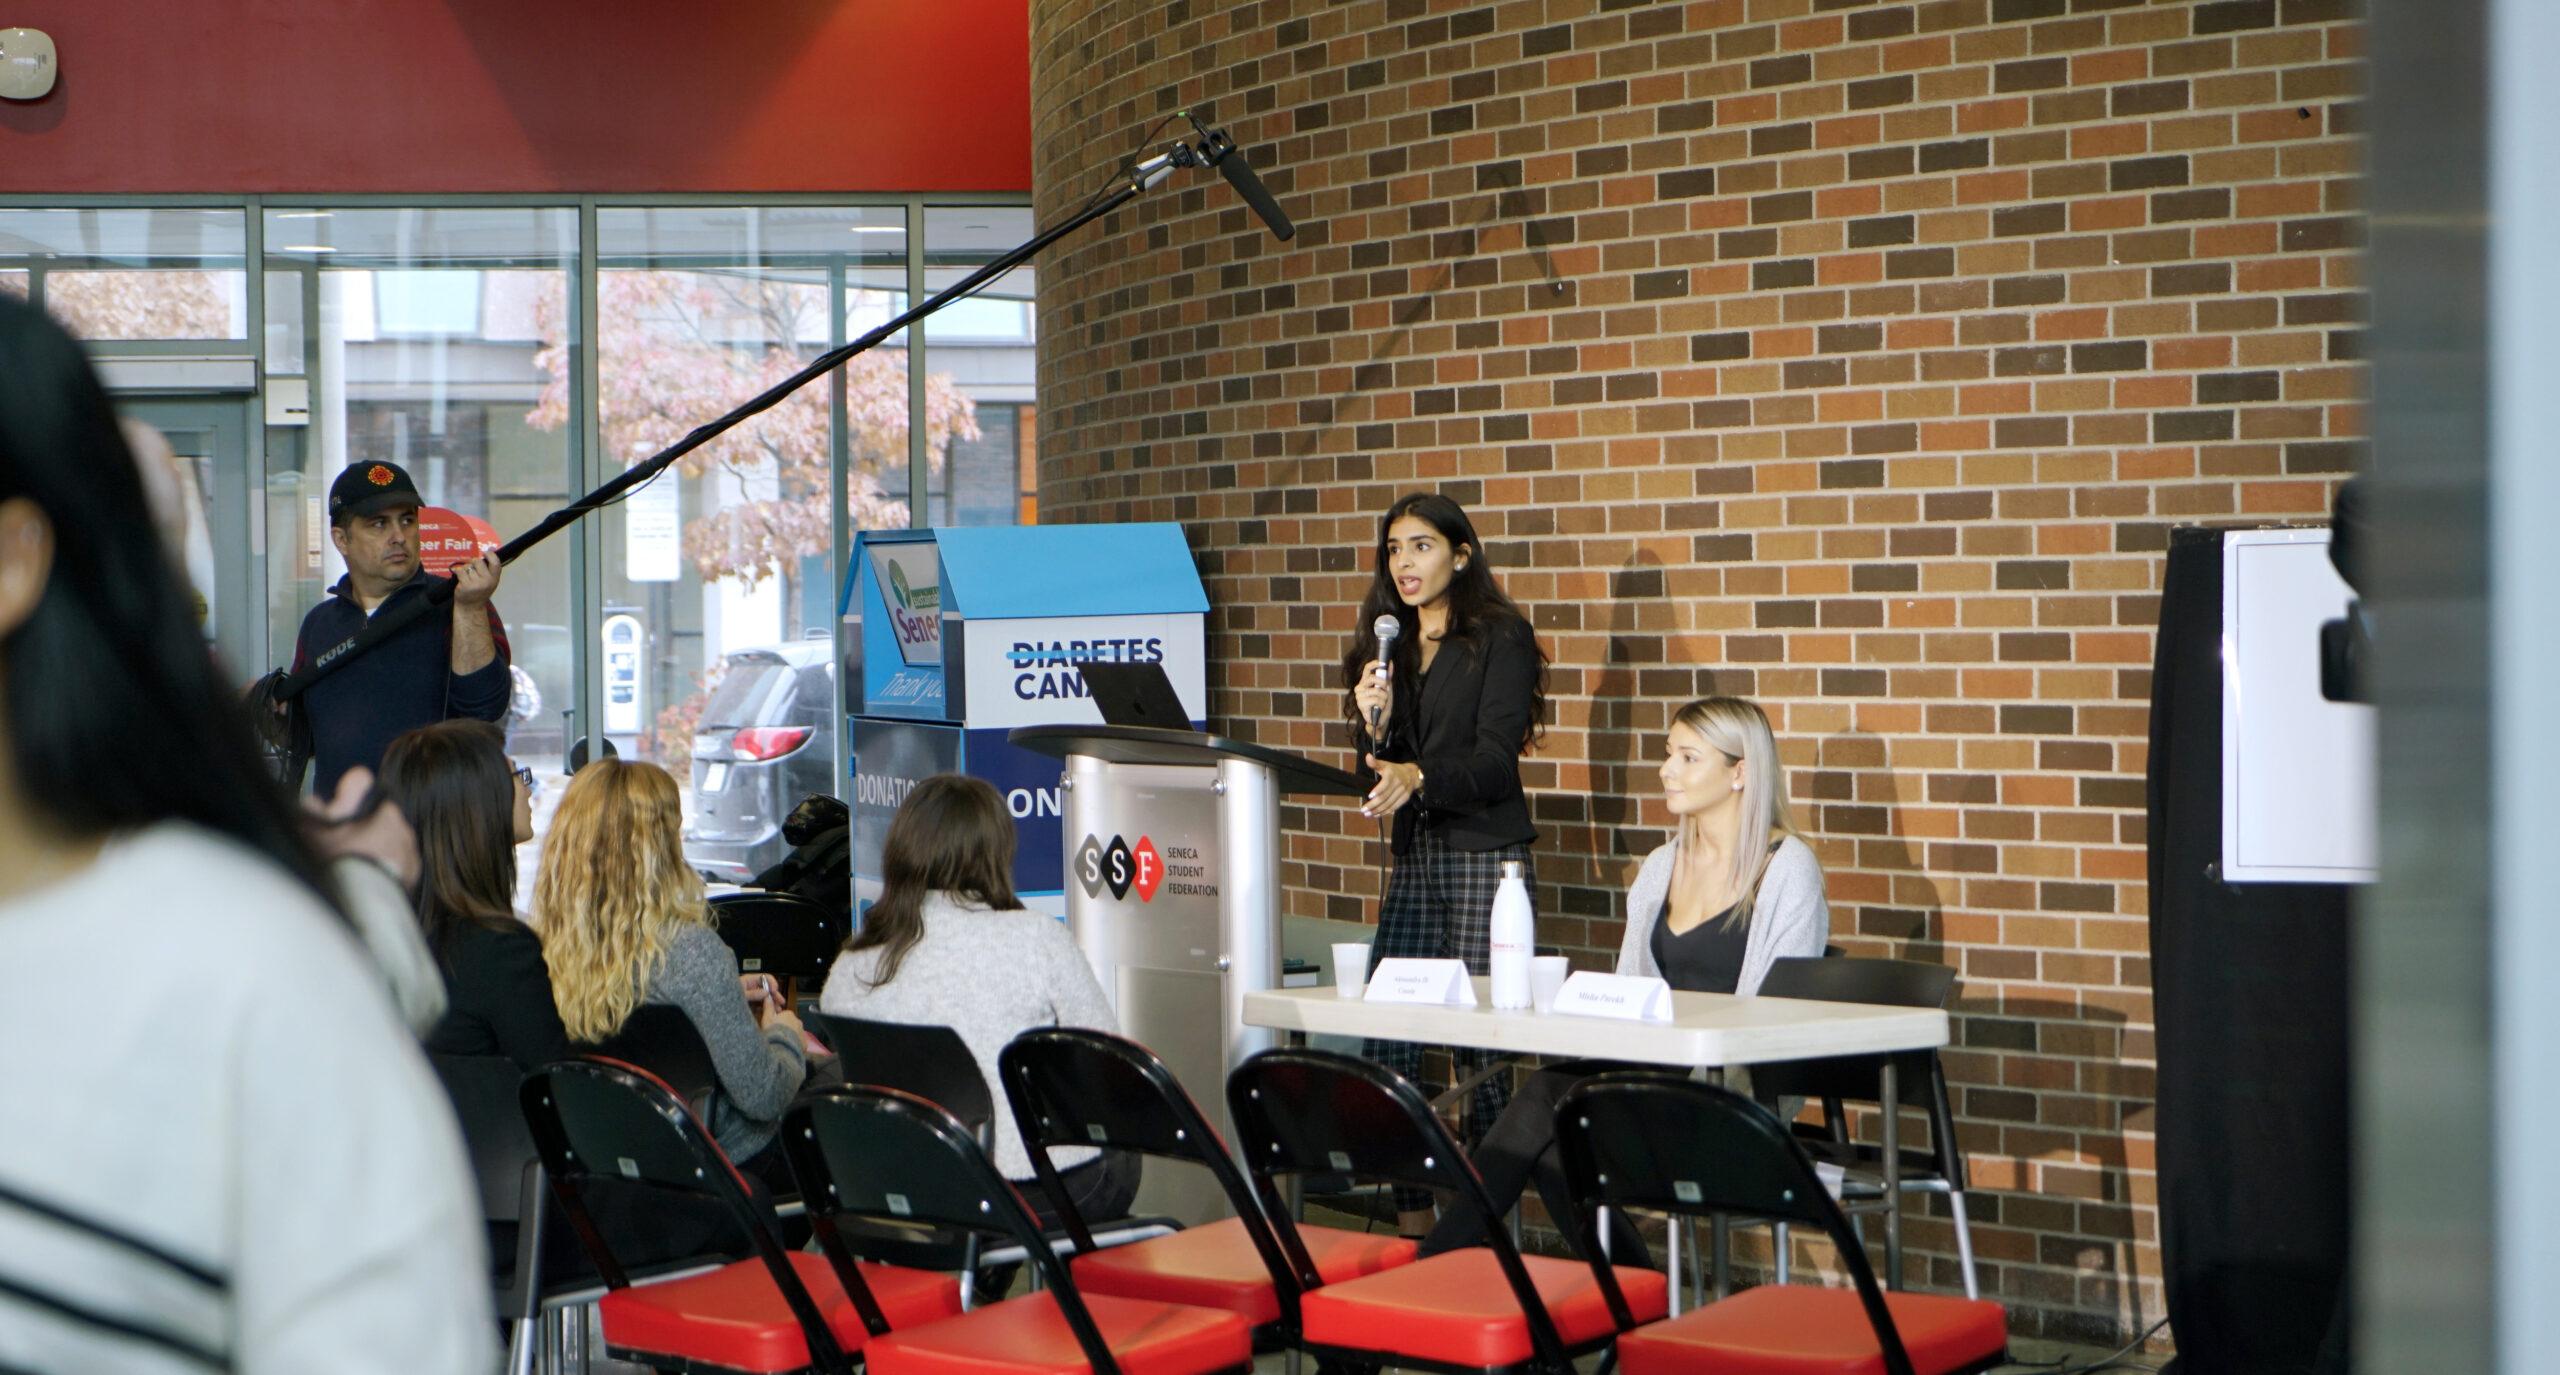 PR Students - Freedom of Speech